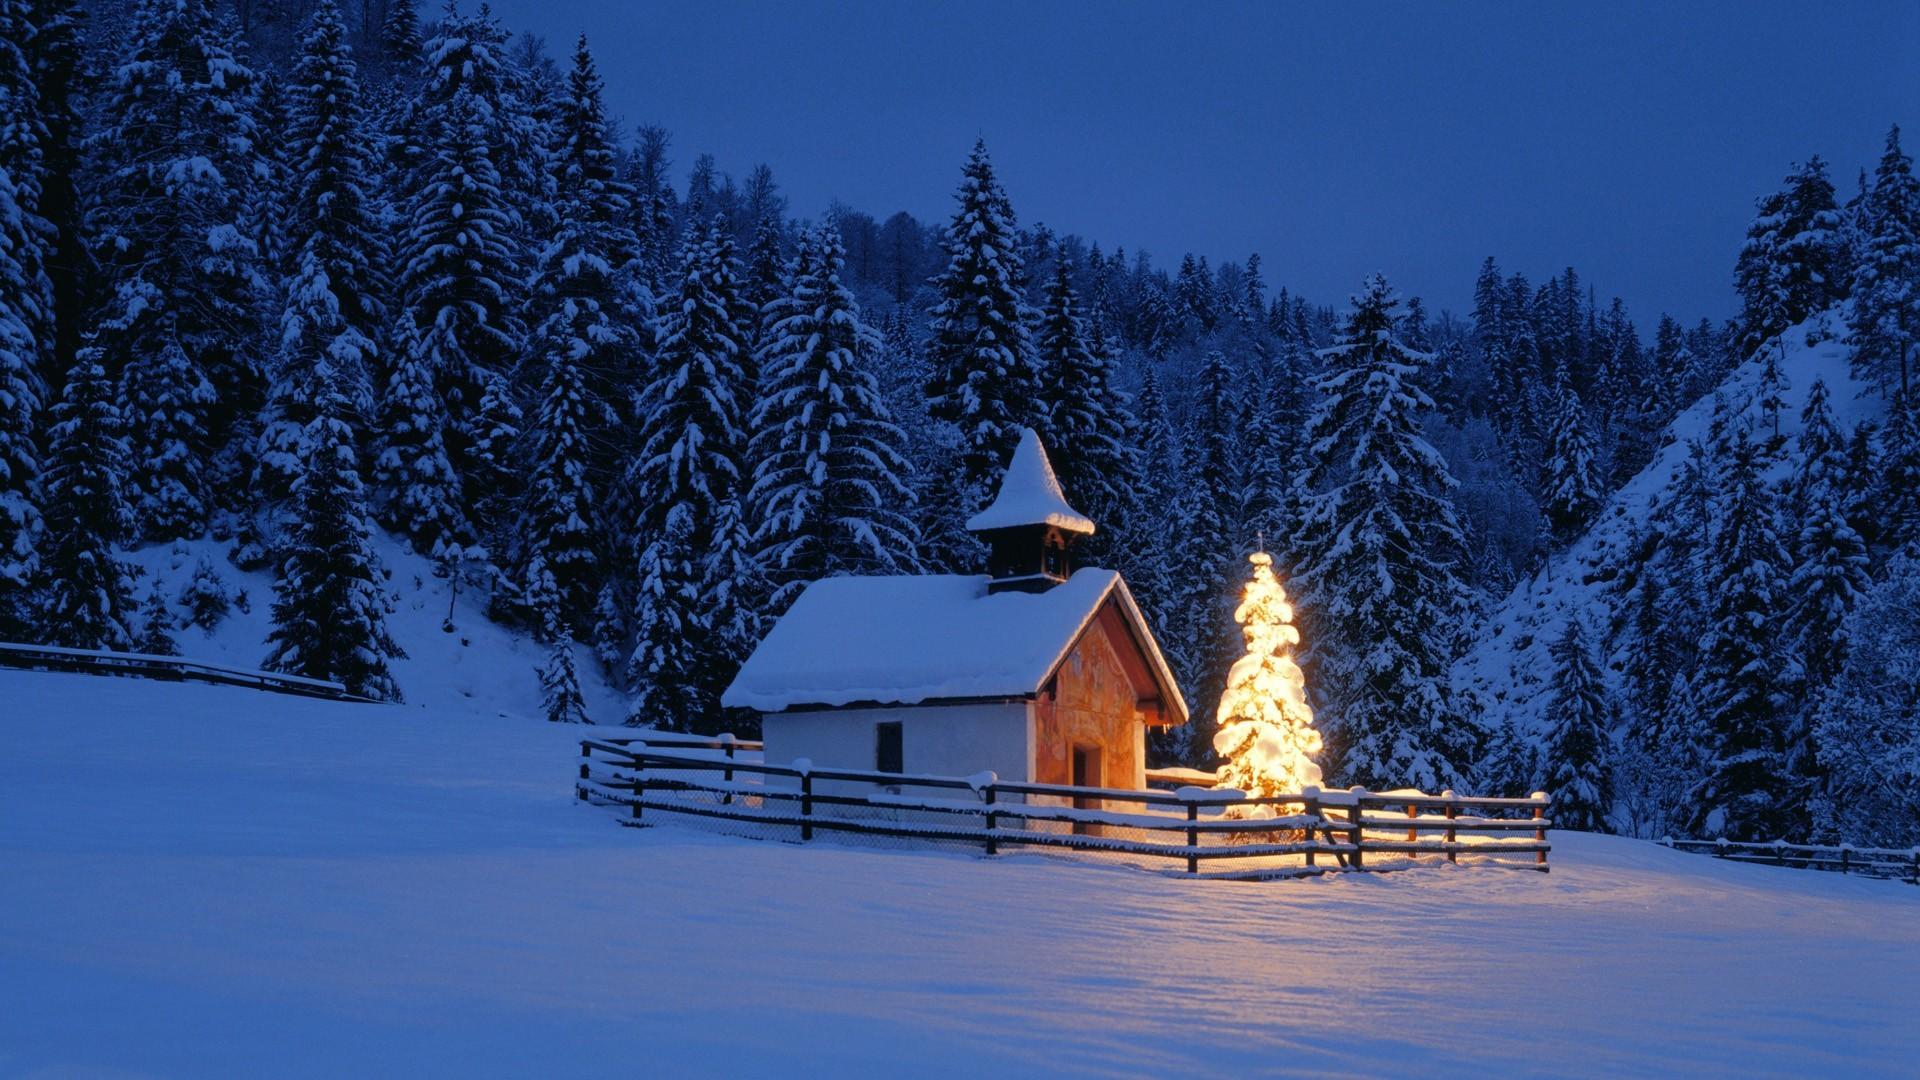 Free Winter Screensavers And Wallpaper